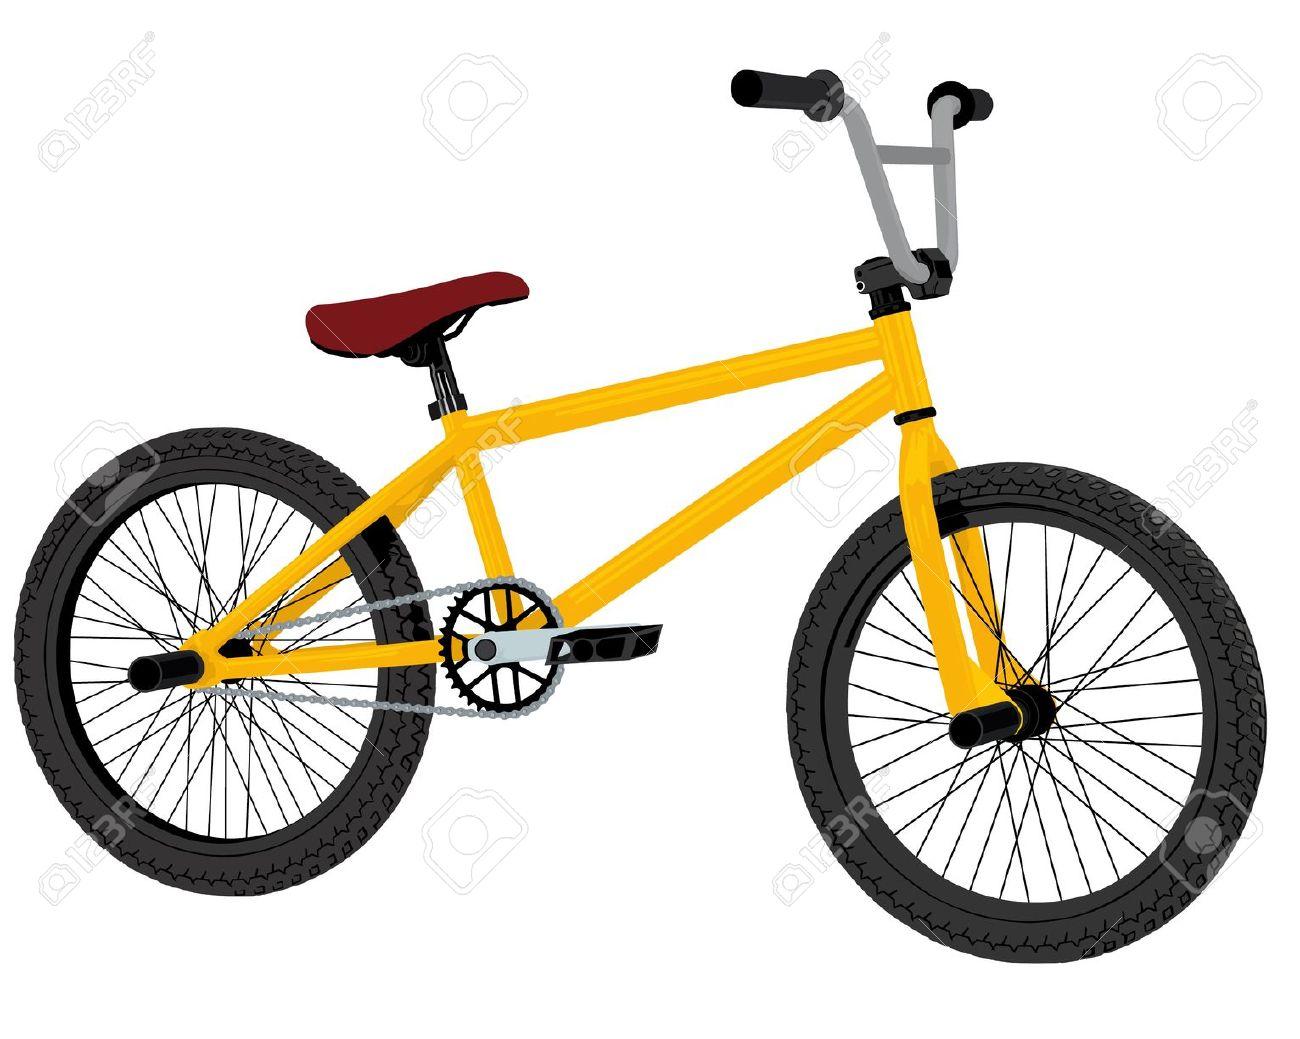 Bmx bike clip art.